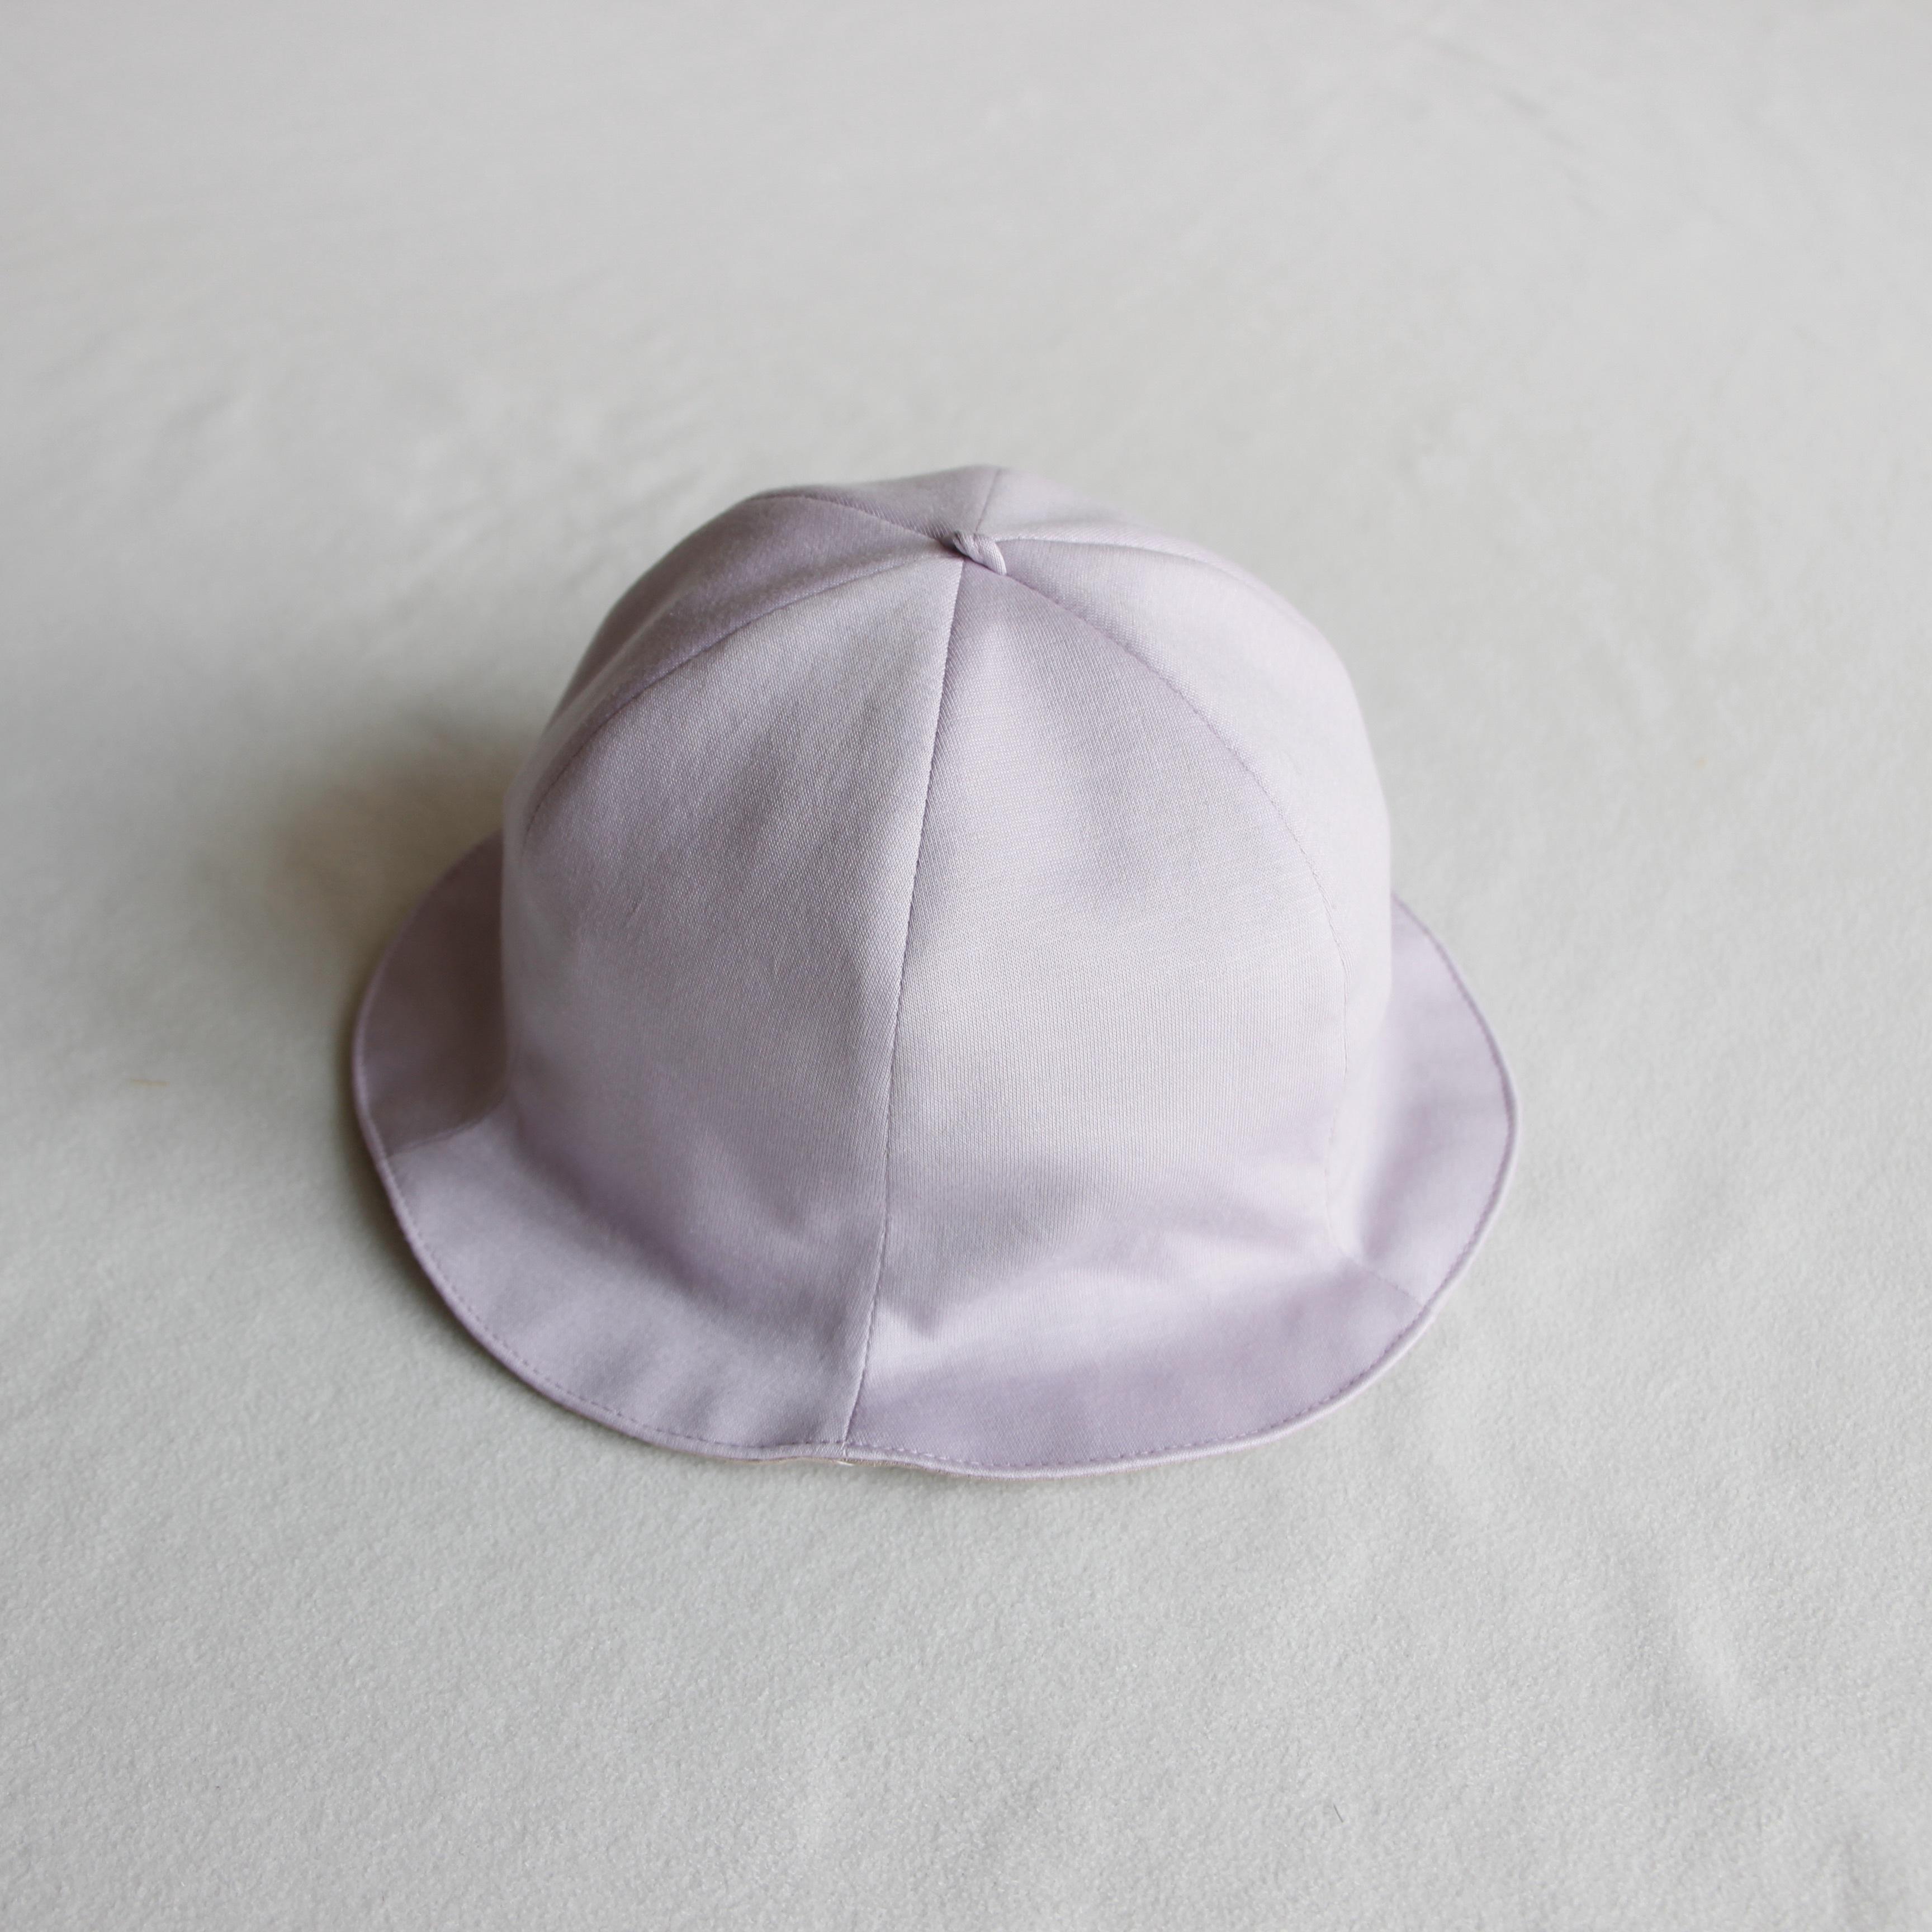 《mimi poupons 2021SS》チューリップハット / lavender / onesize(46-48cm)